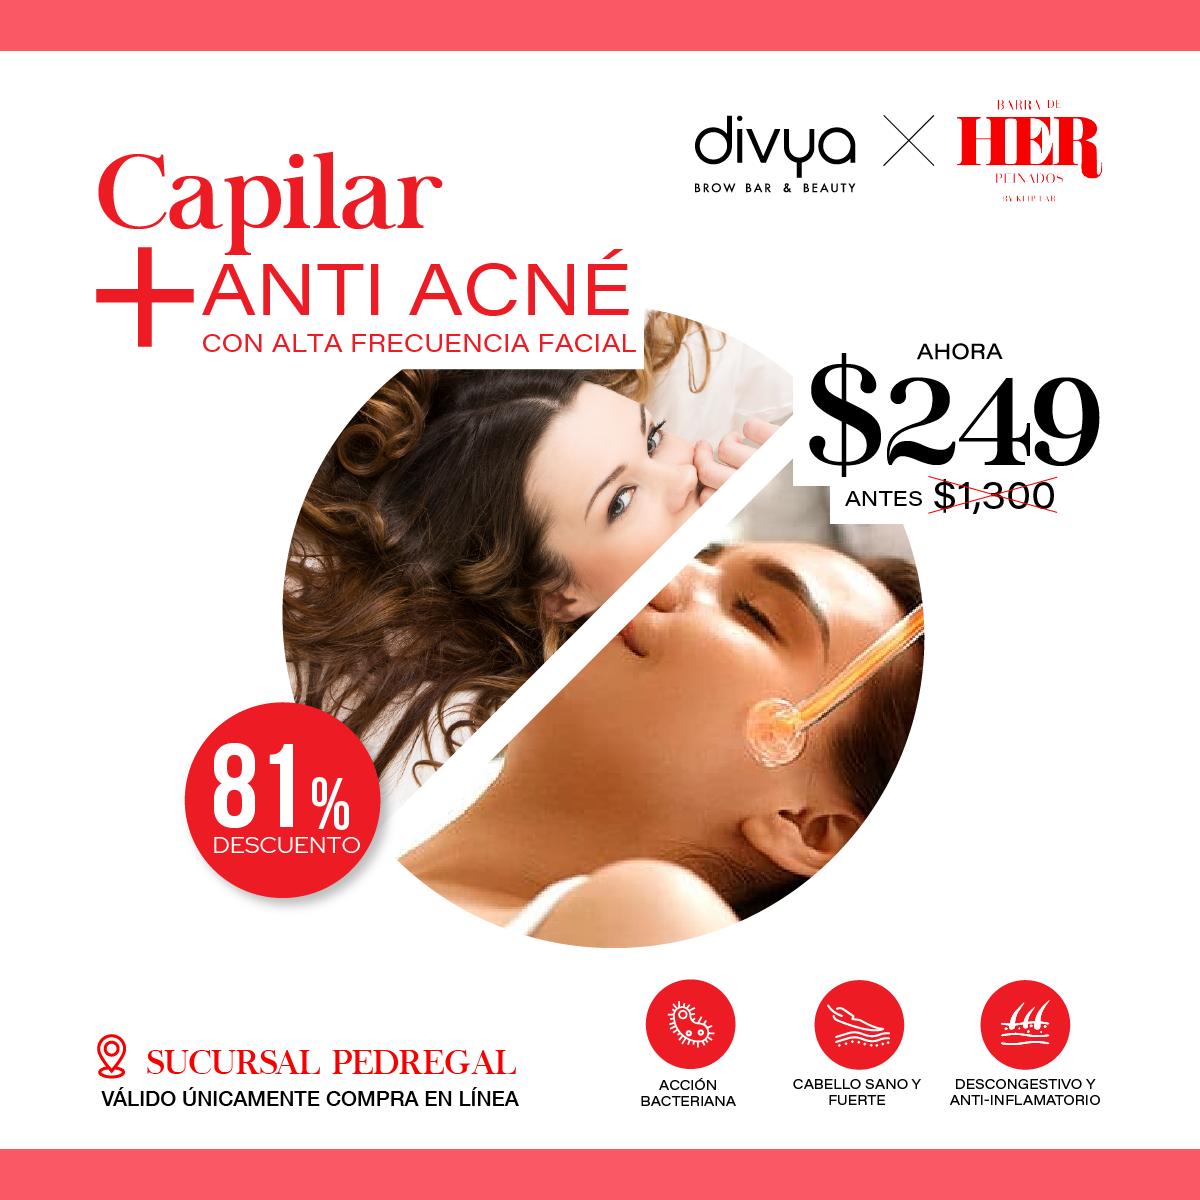 Capilar + Anti Acné con Alta Frecuencia- DIVYA X HER&w=900&h=900&fit=crop